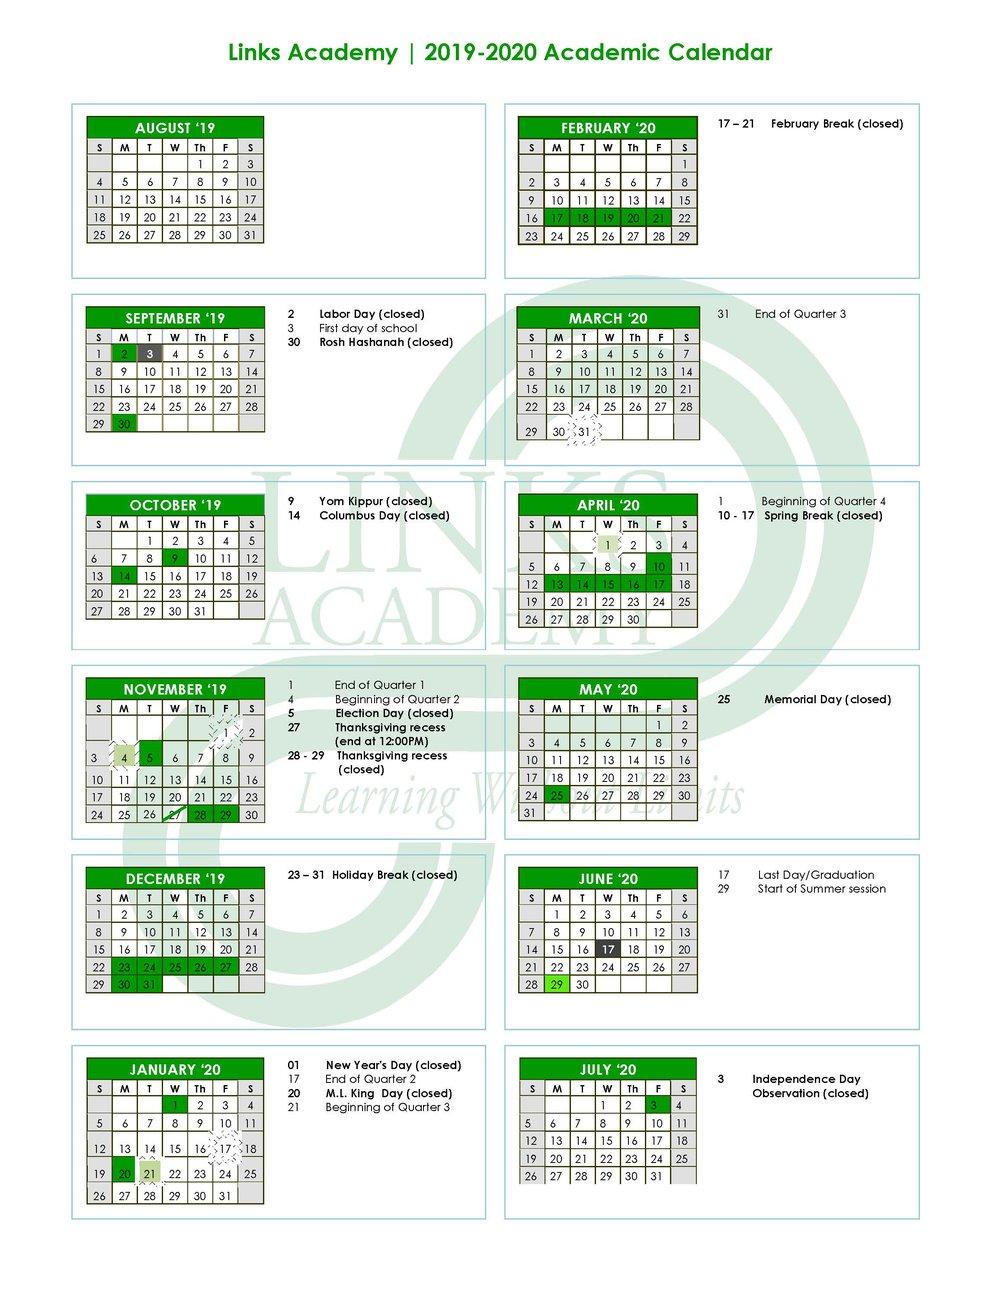 Academic Calendar — Links Academy Regarding Queensborough Community College Academic Calendar